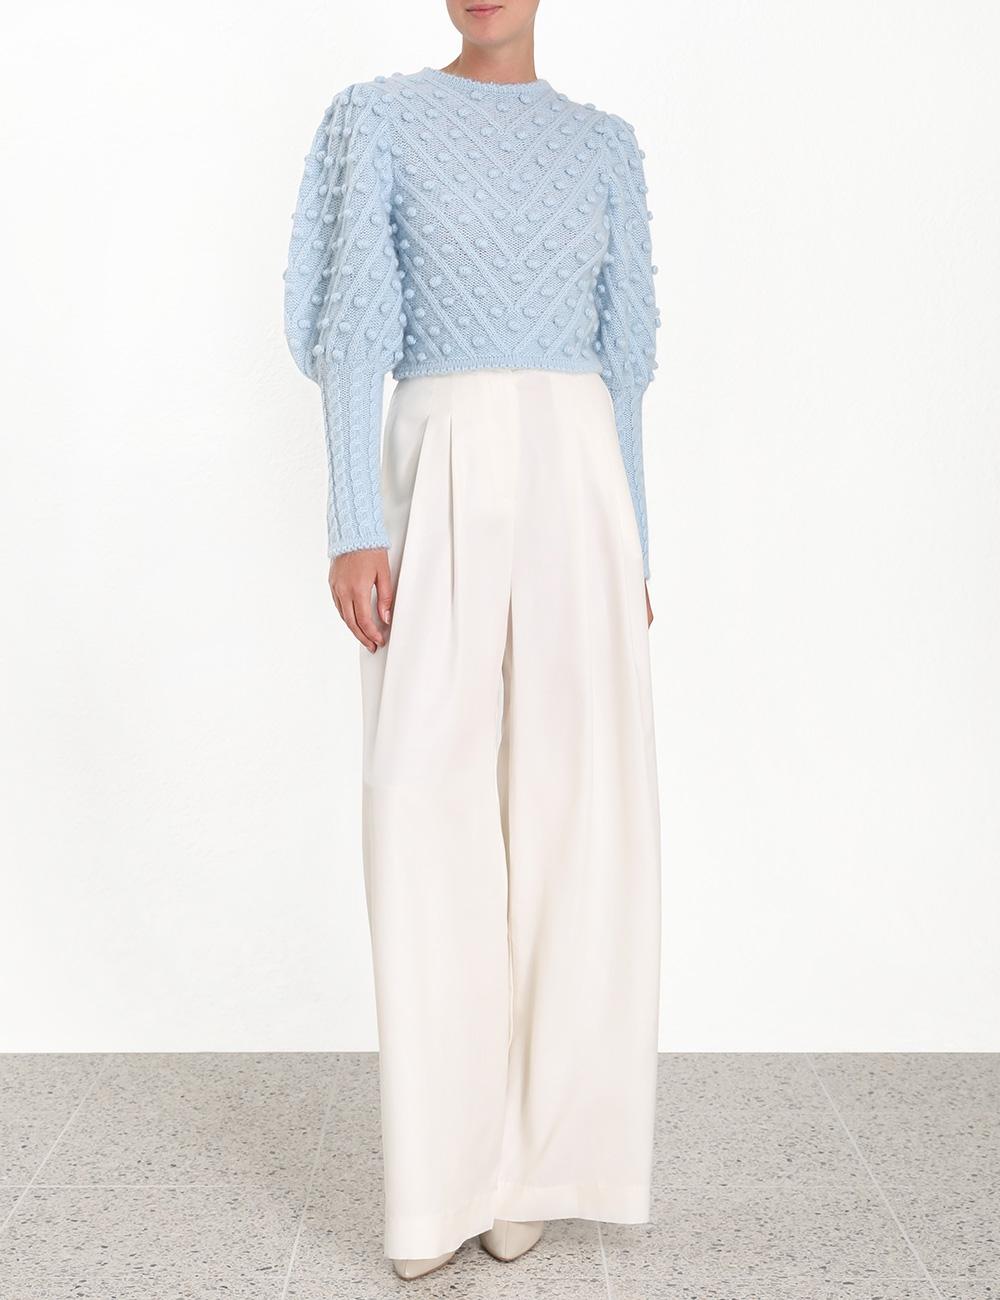 Moncur Bauble Sweater